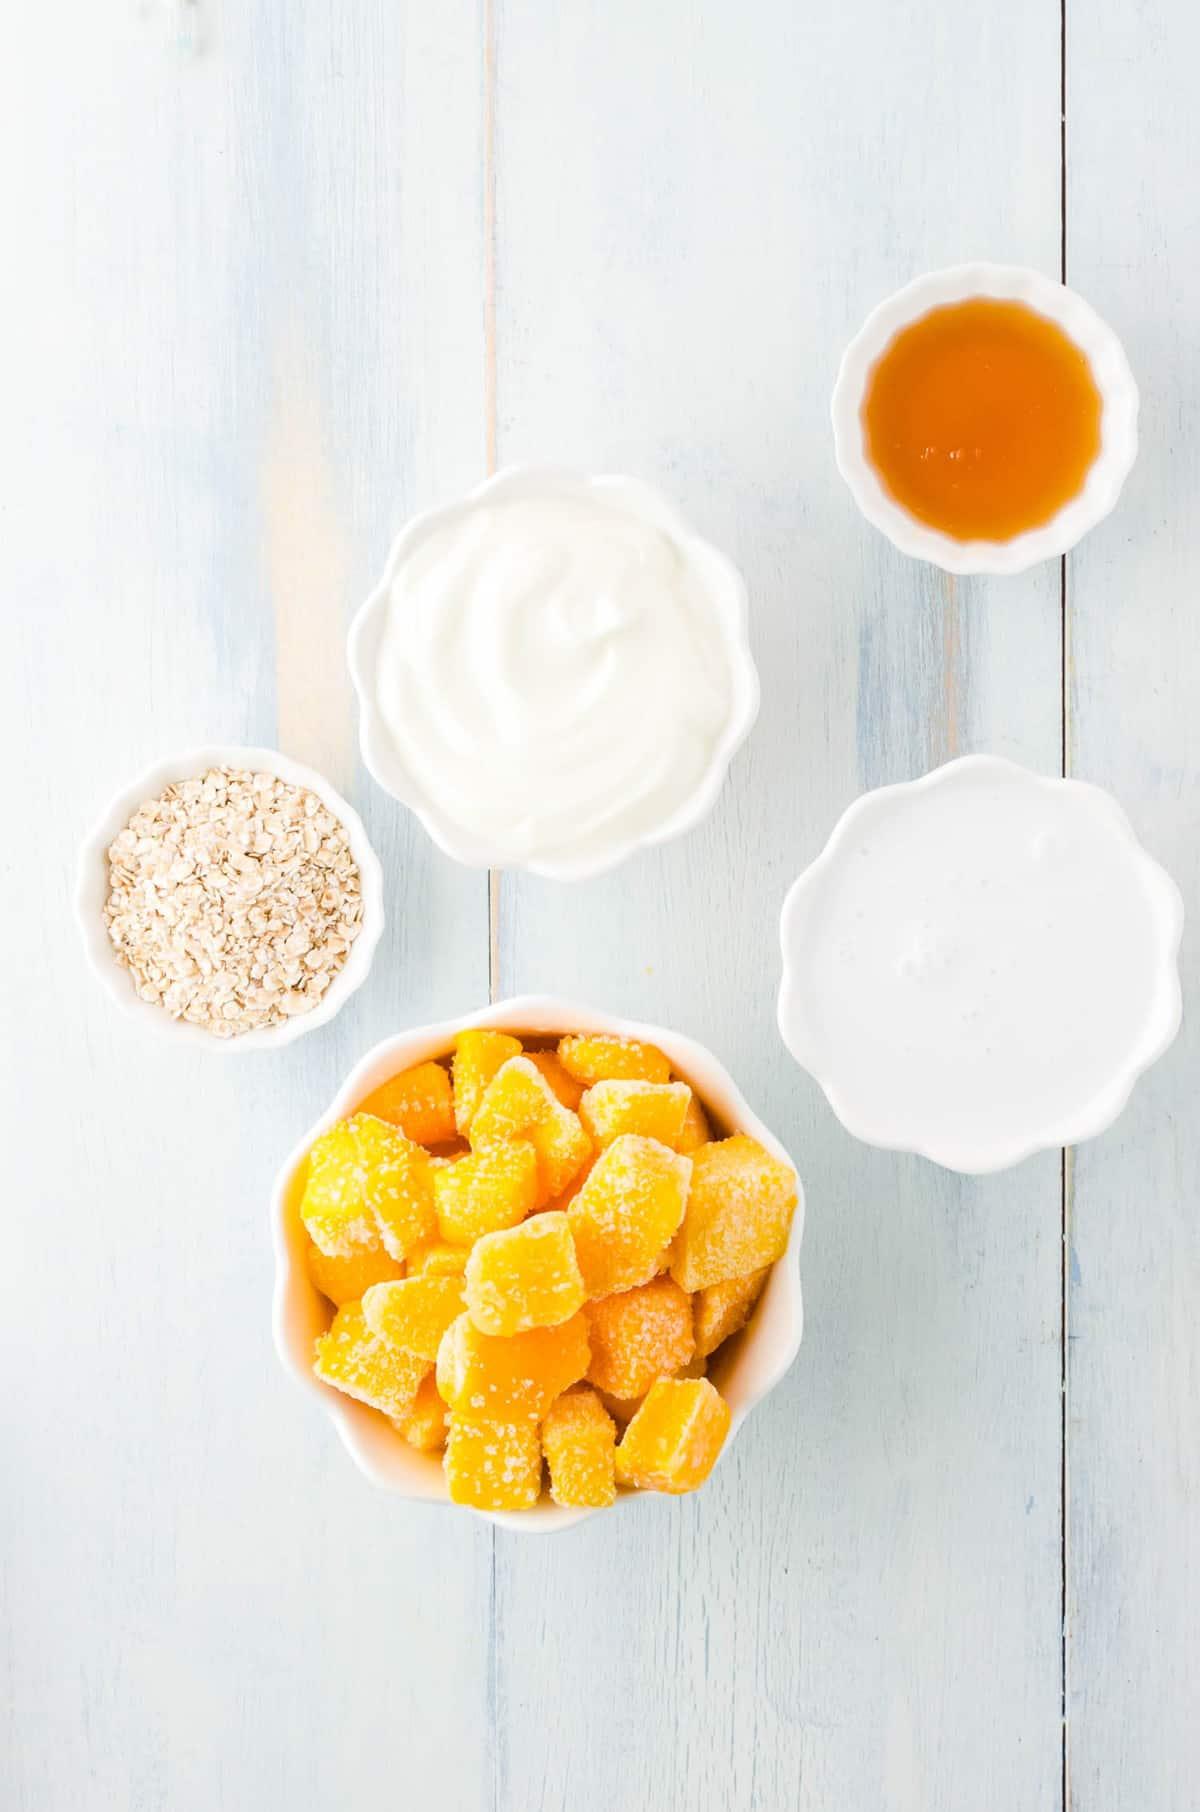 Overhead view of bowls of ingredients: mango, coconut milk, yogurt, milk, and honey.